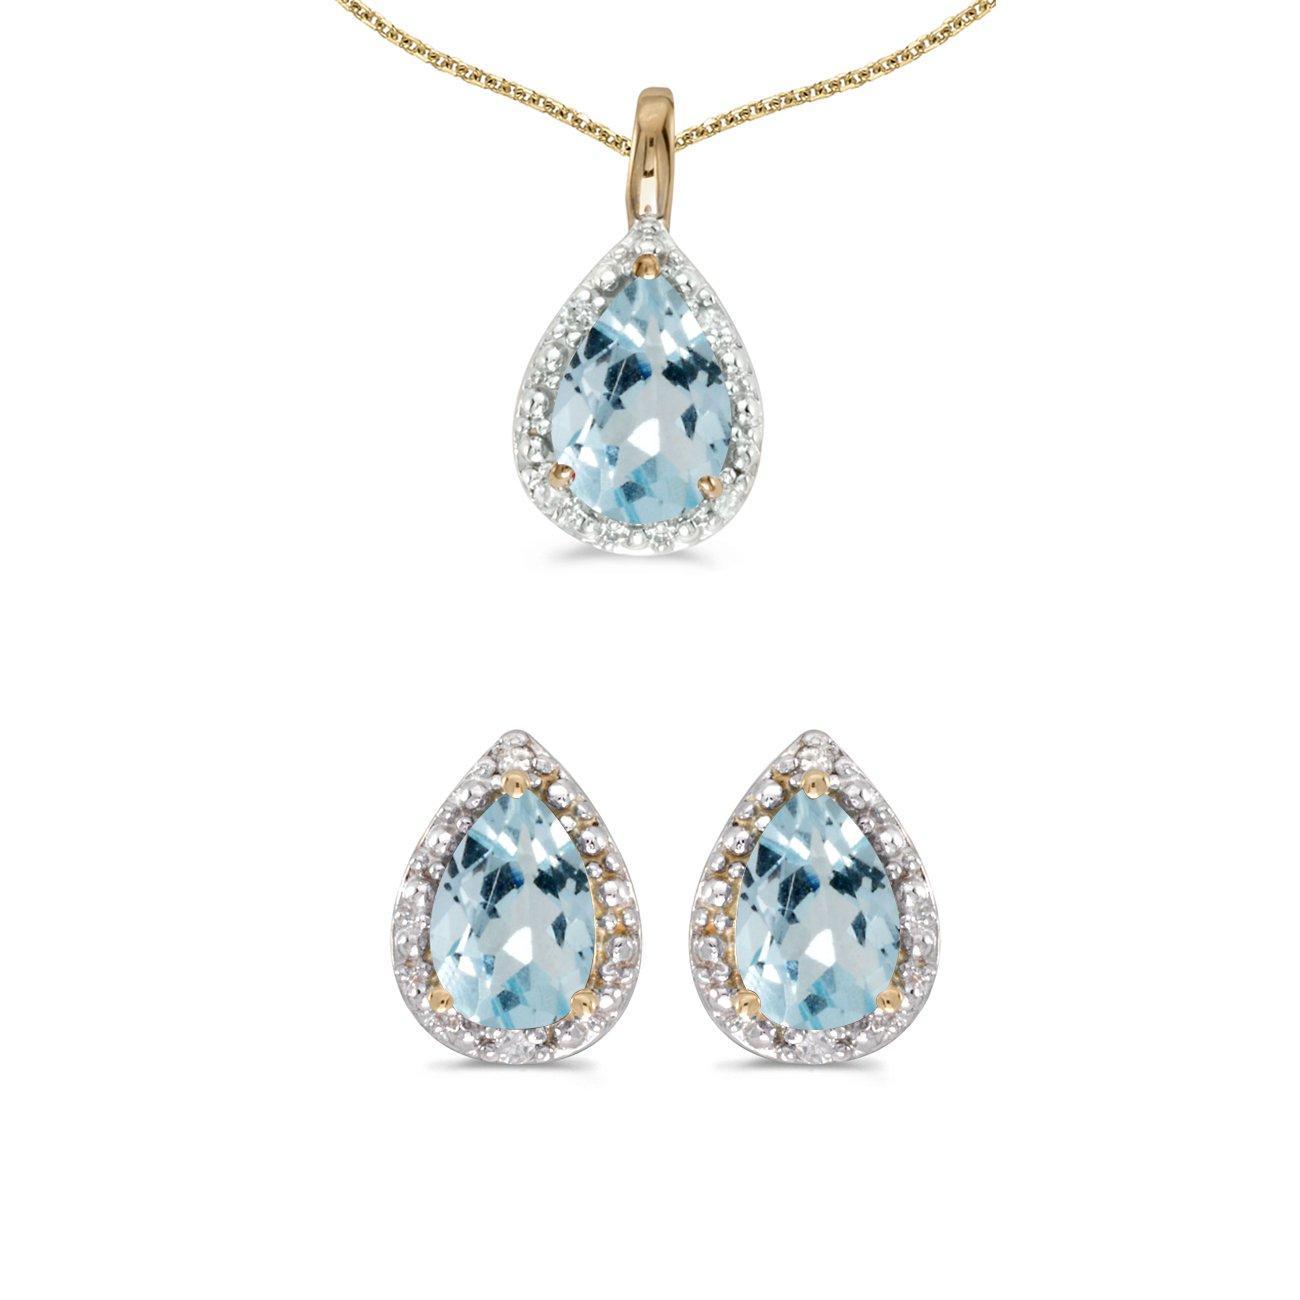 10k Yellow Gold Pear Aquamarine And Diamond Earrings and Pendant Set